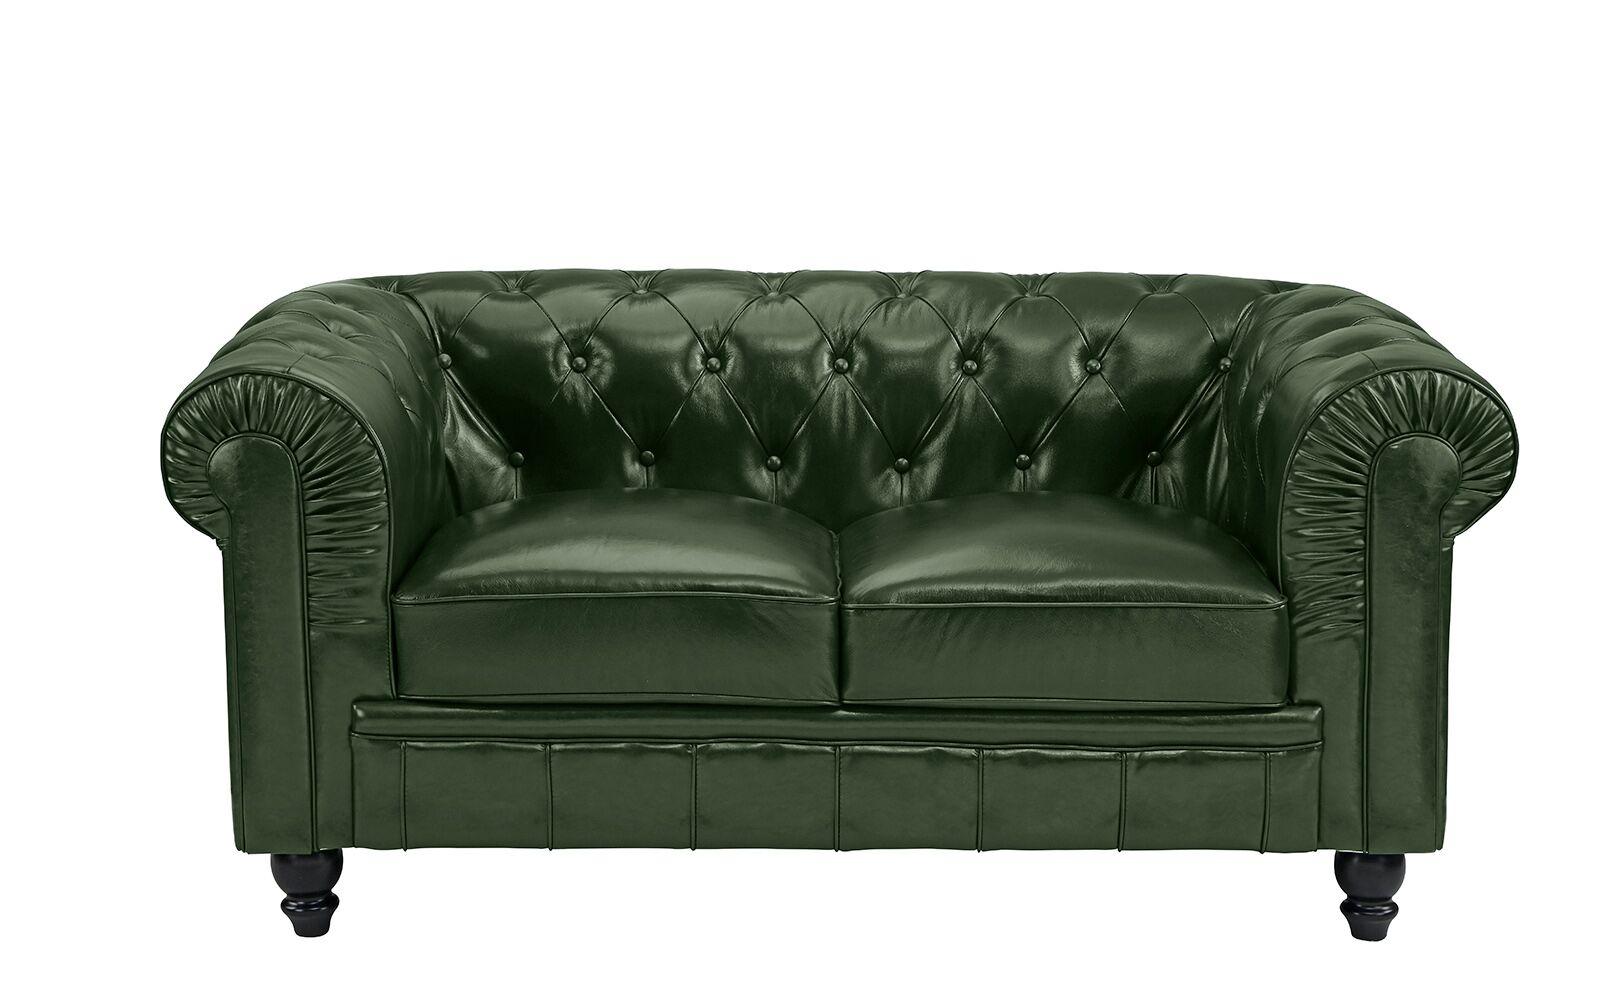 Mckayla Leather Chesterfield Loveseat Finish: Green